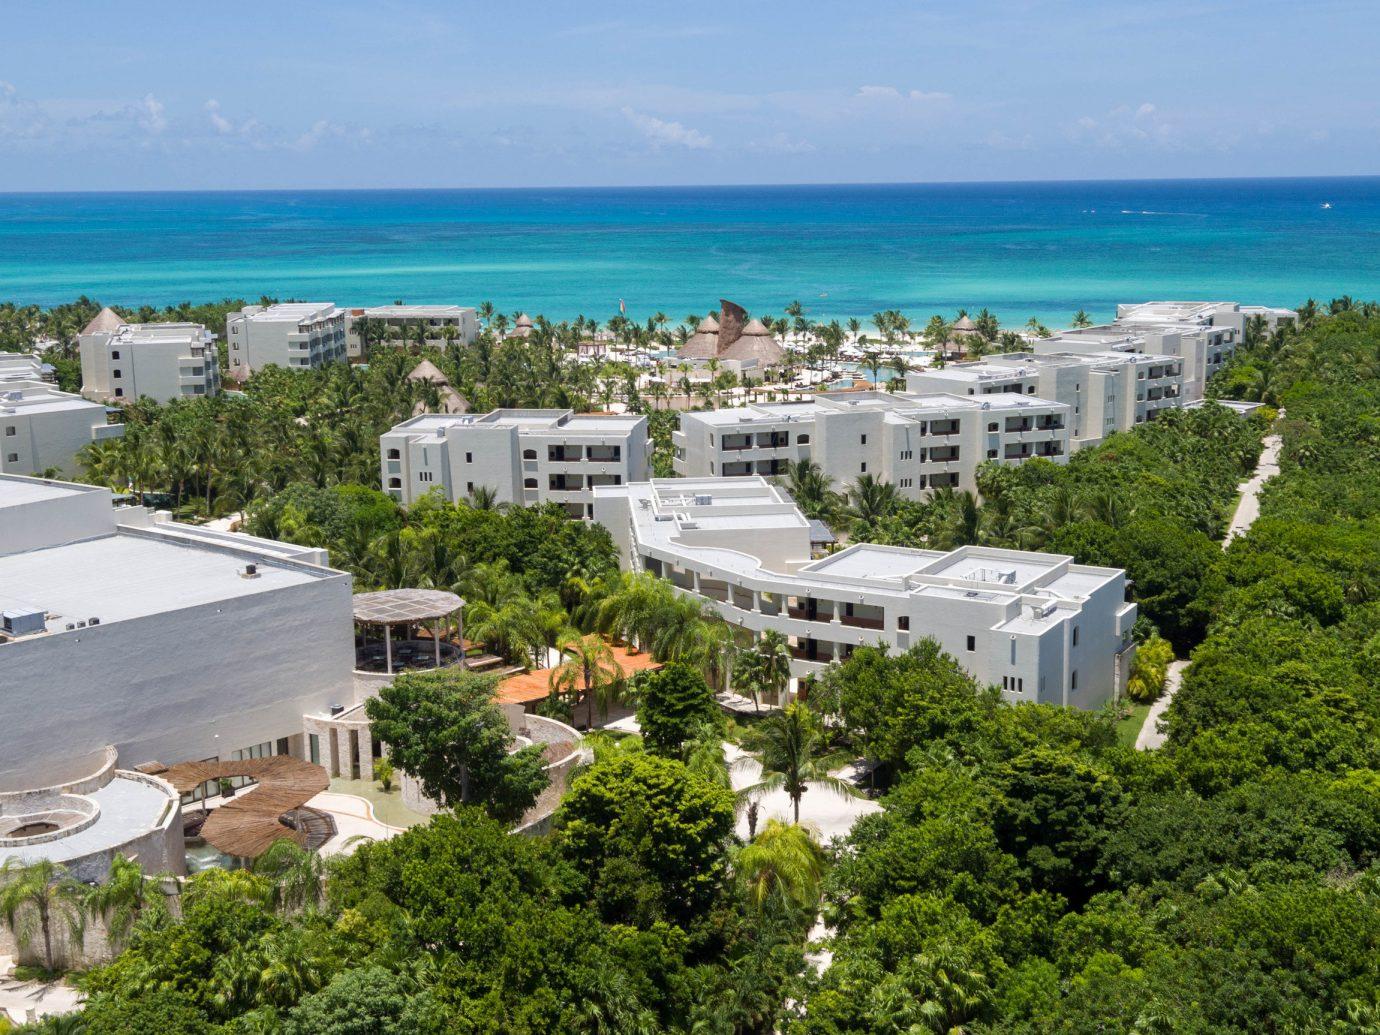 Hotels sky tree outdoor ecosystem vacation Coast Nature Sea aerial photography Ocean estate Resort cape bird's eye view bay shore traveling